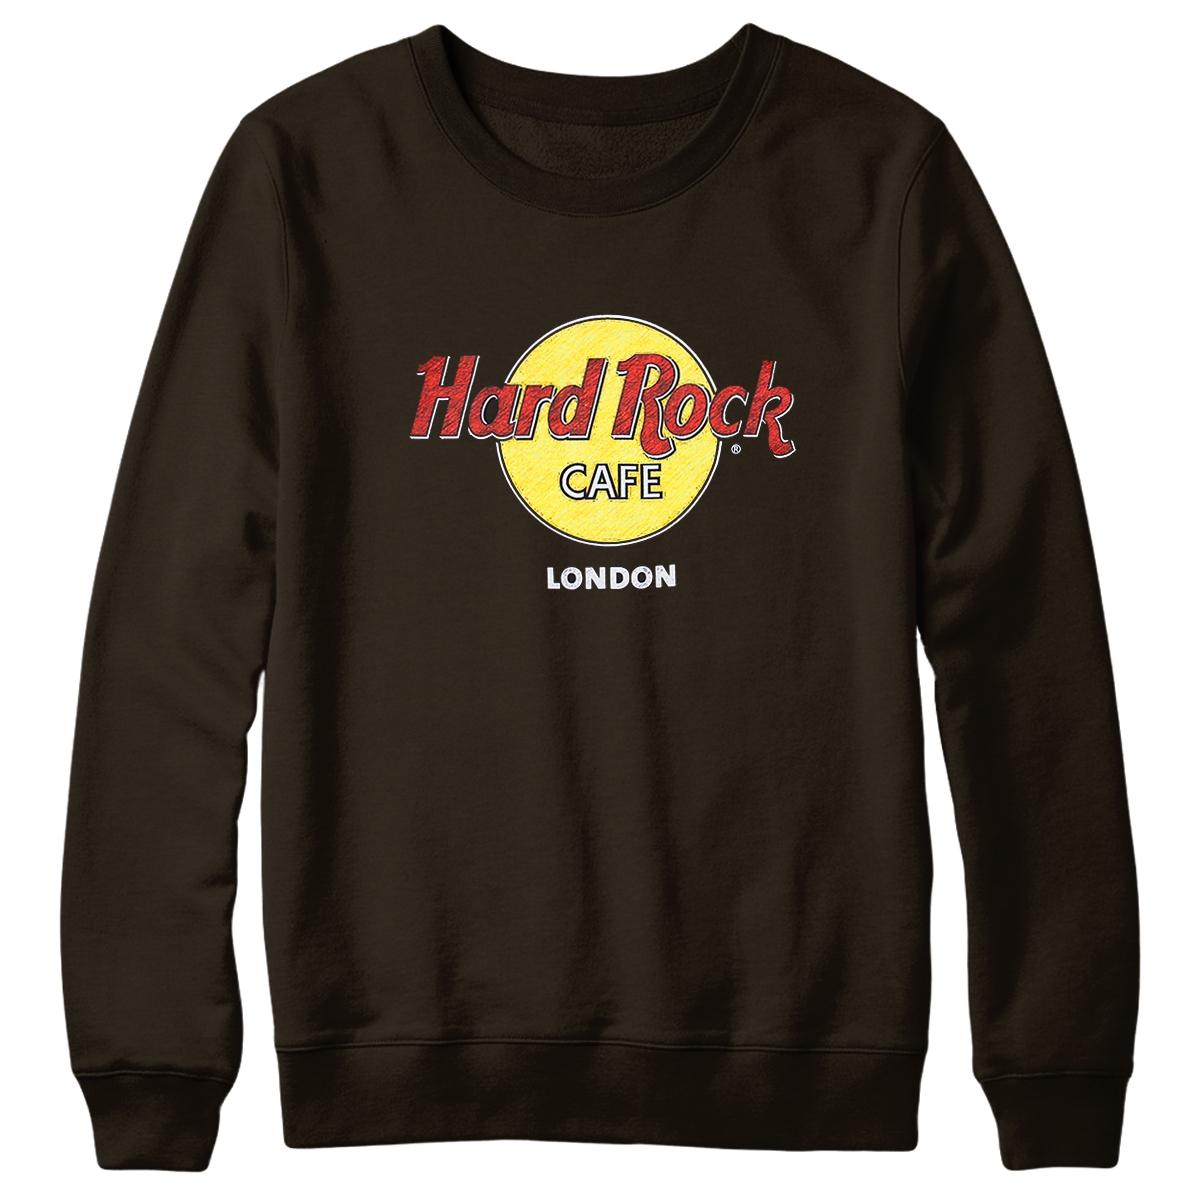 Throwback Logo Sweatshirt London 0